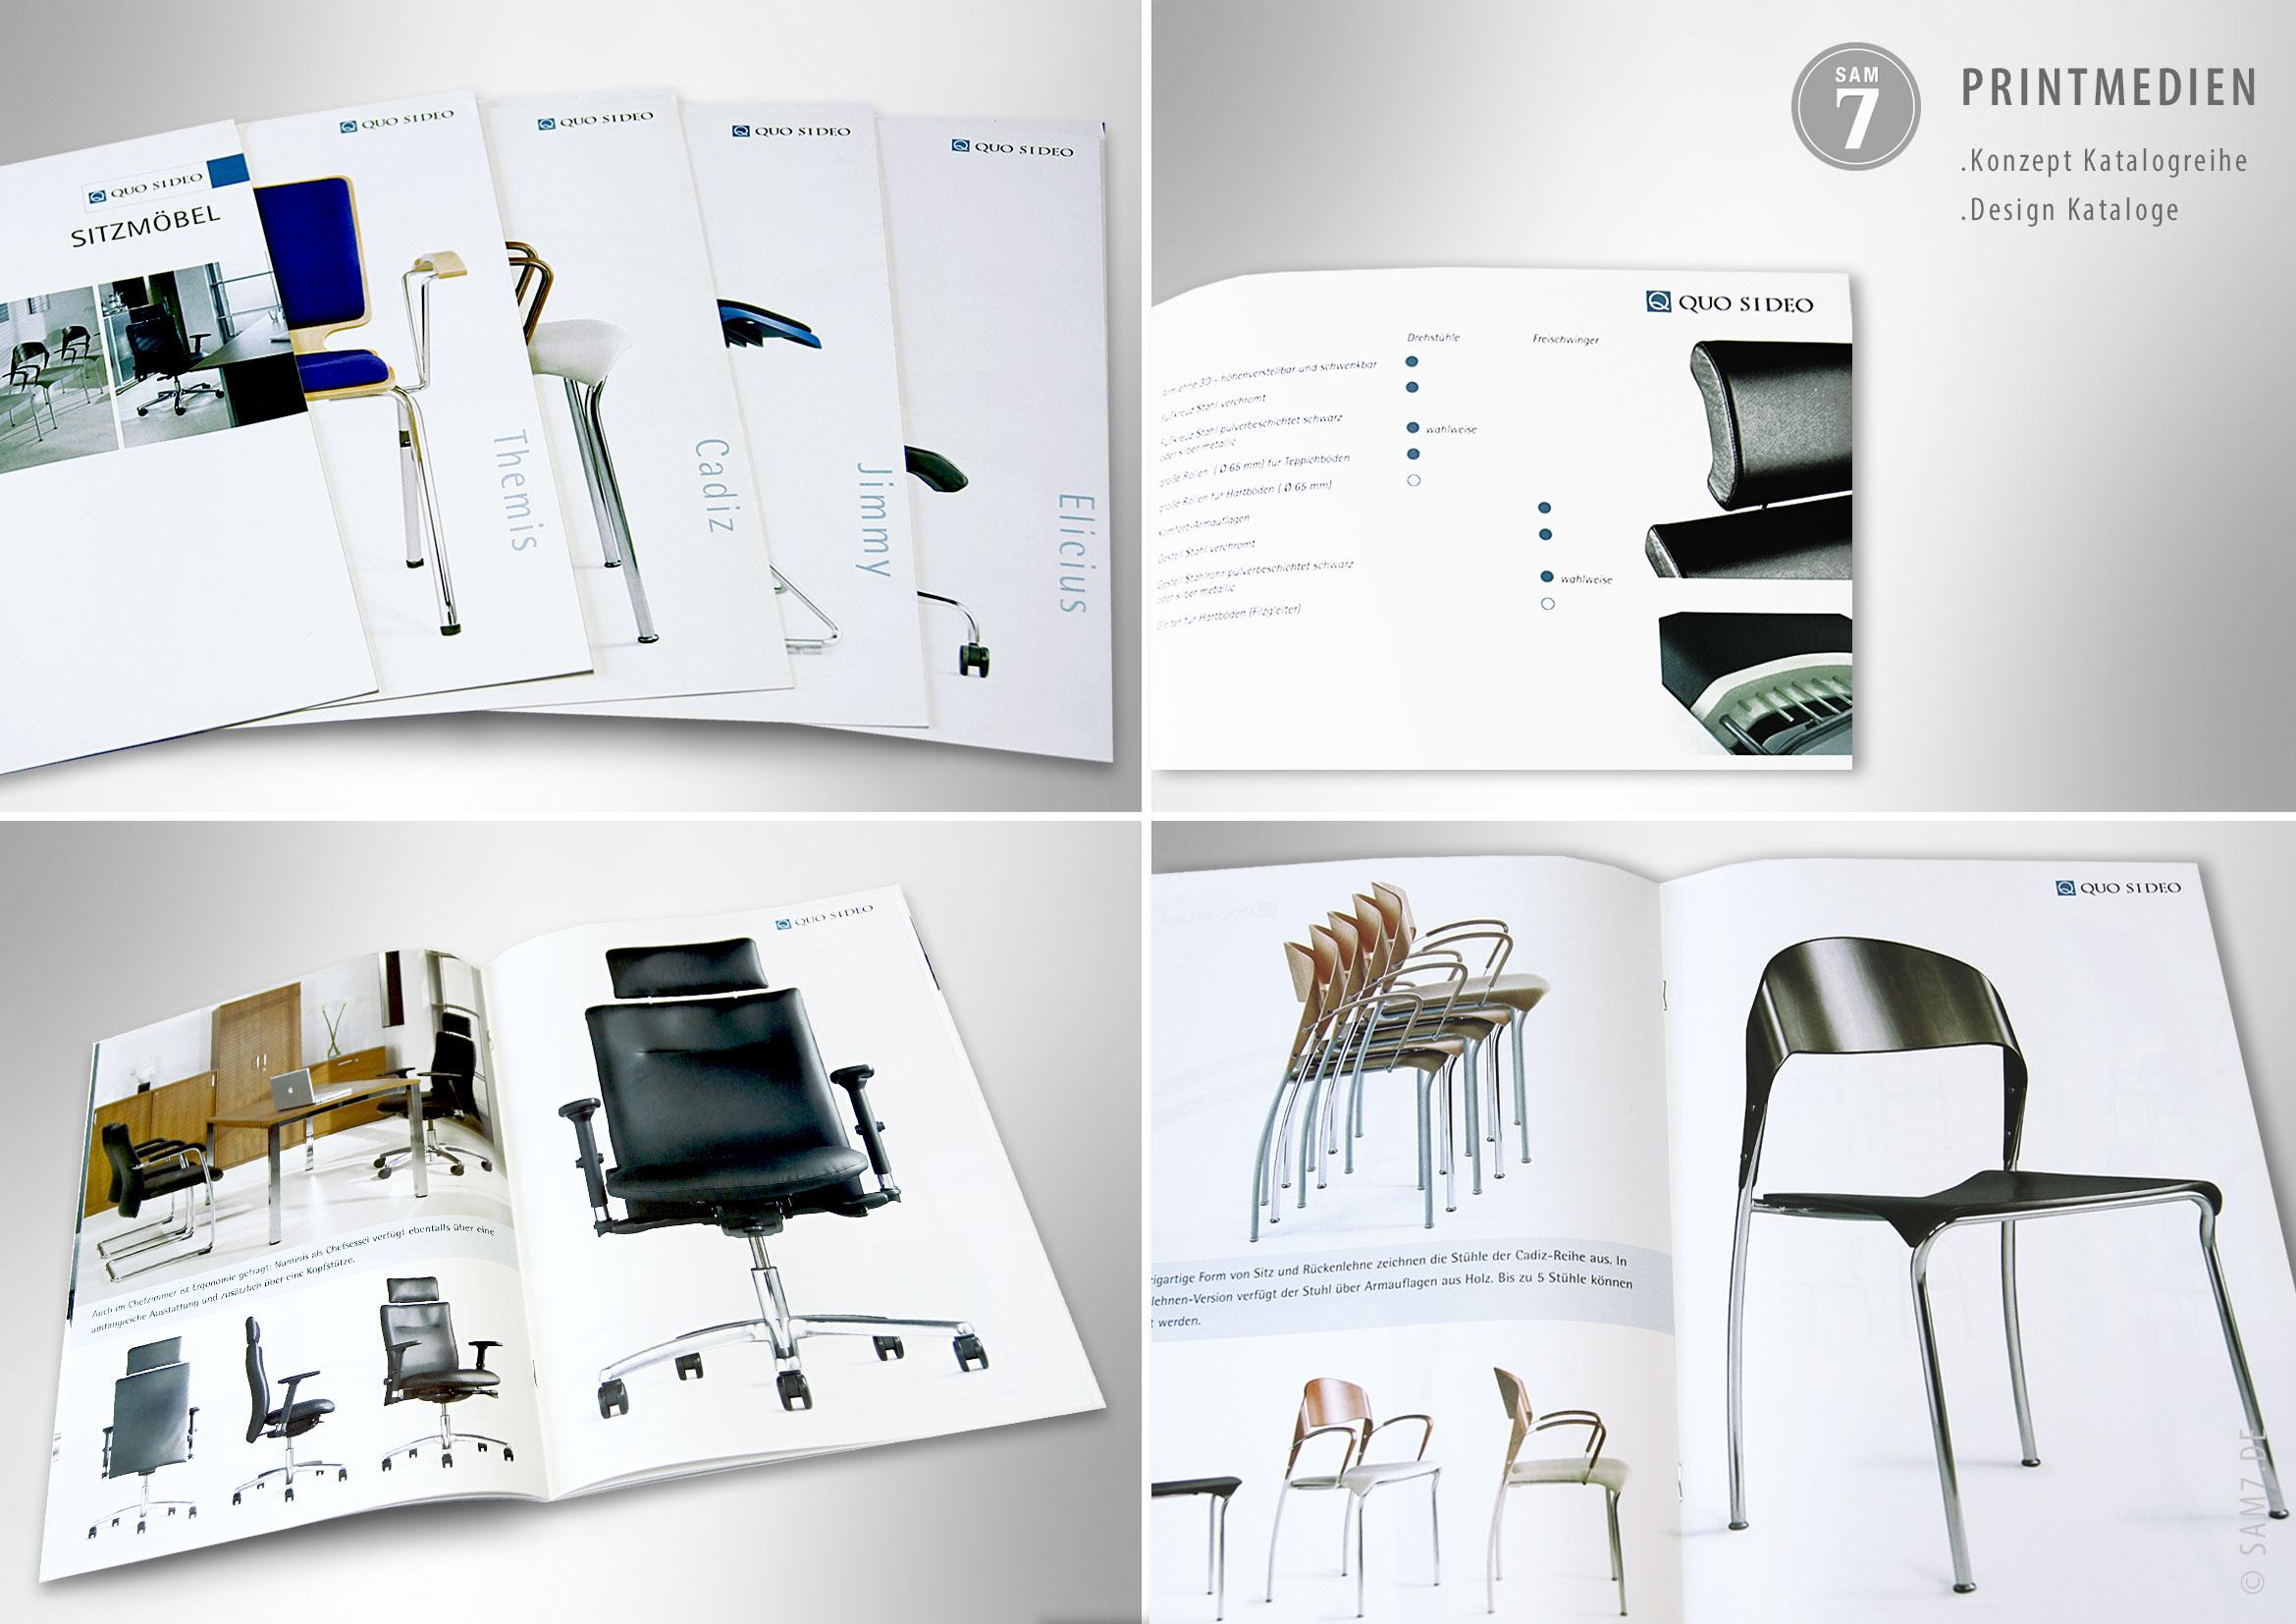 Katalogdesign. Konzept Kataloge.